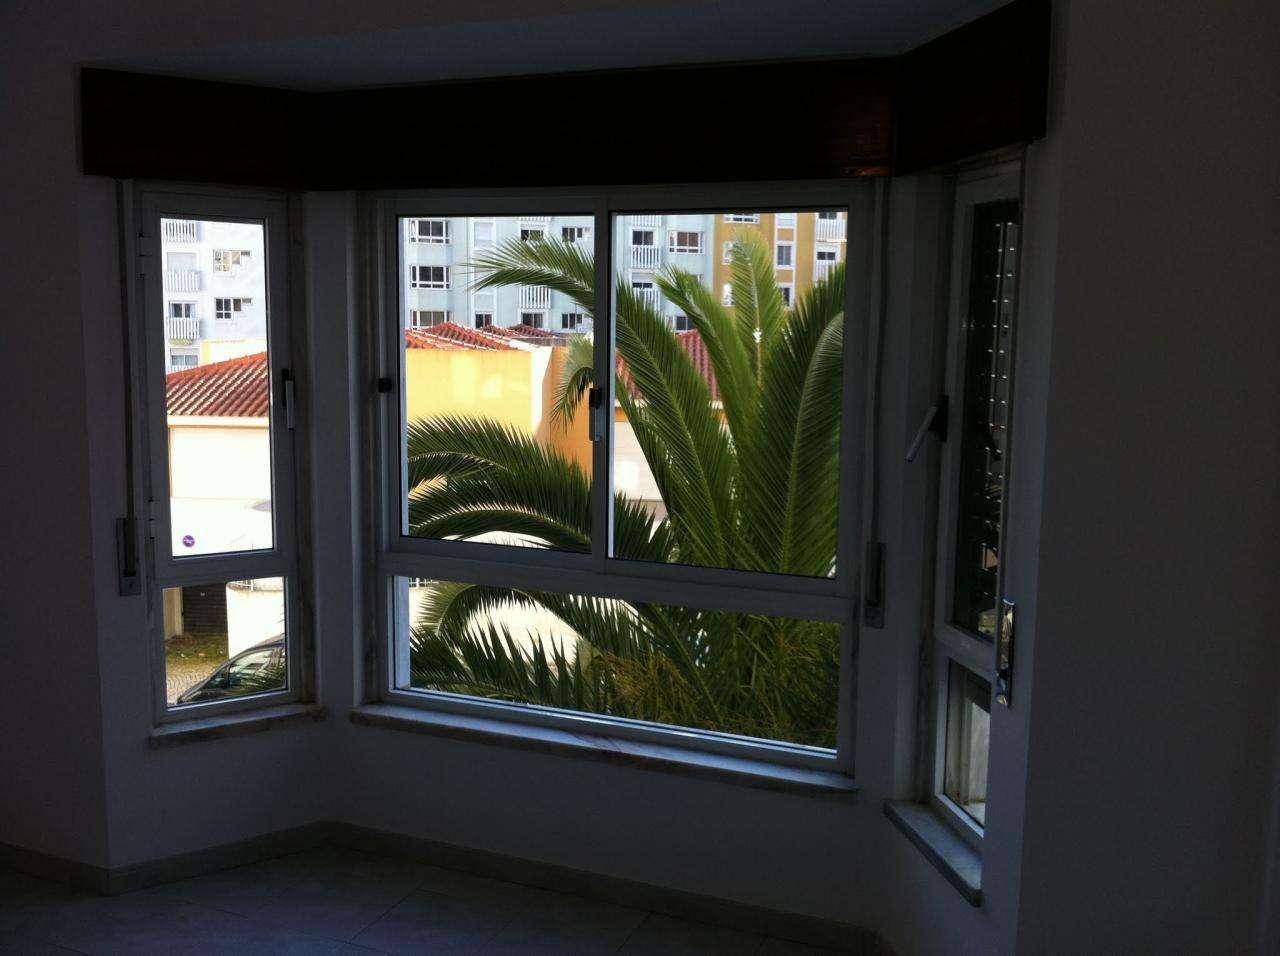 Apartamento para comprar, Rio de Mouro, Sintra, Lisboa - Foto 7